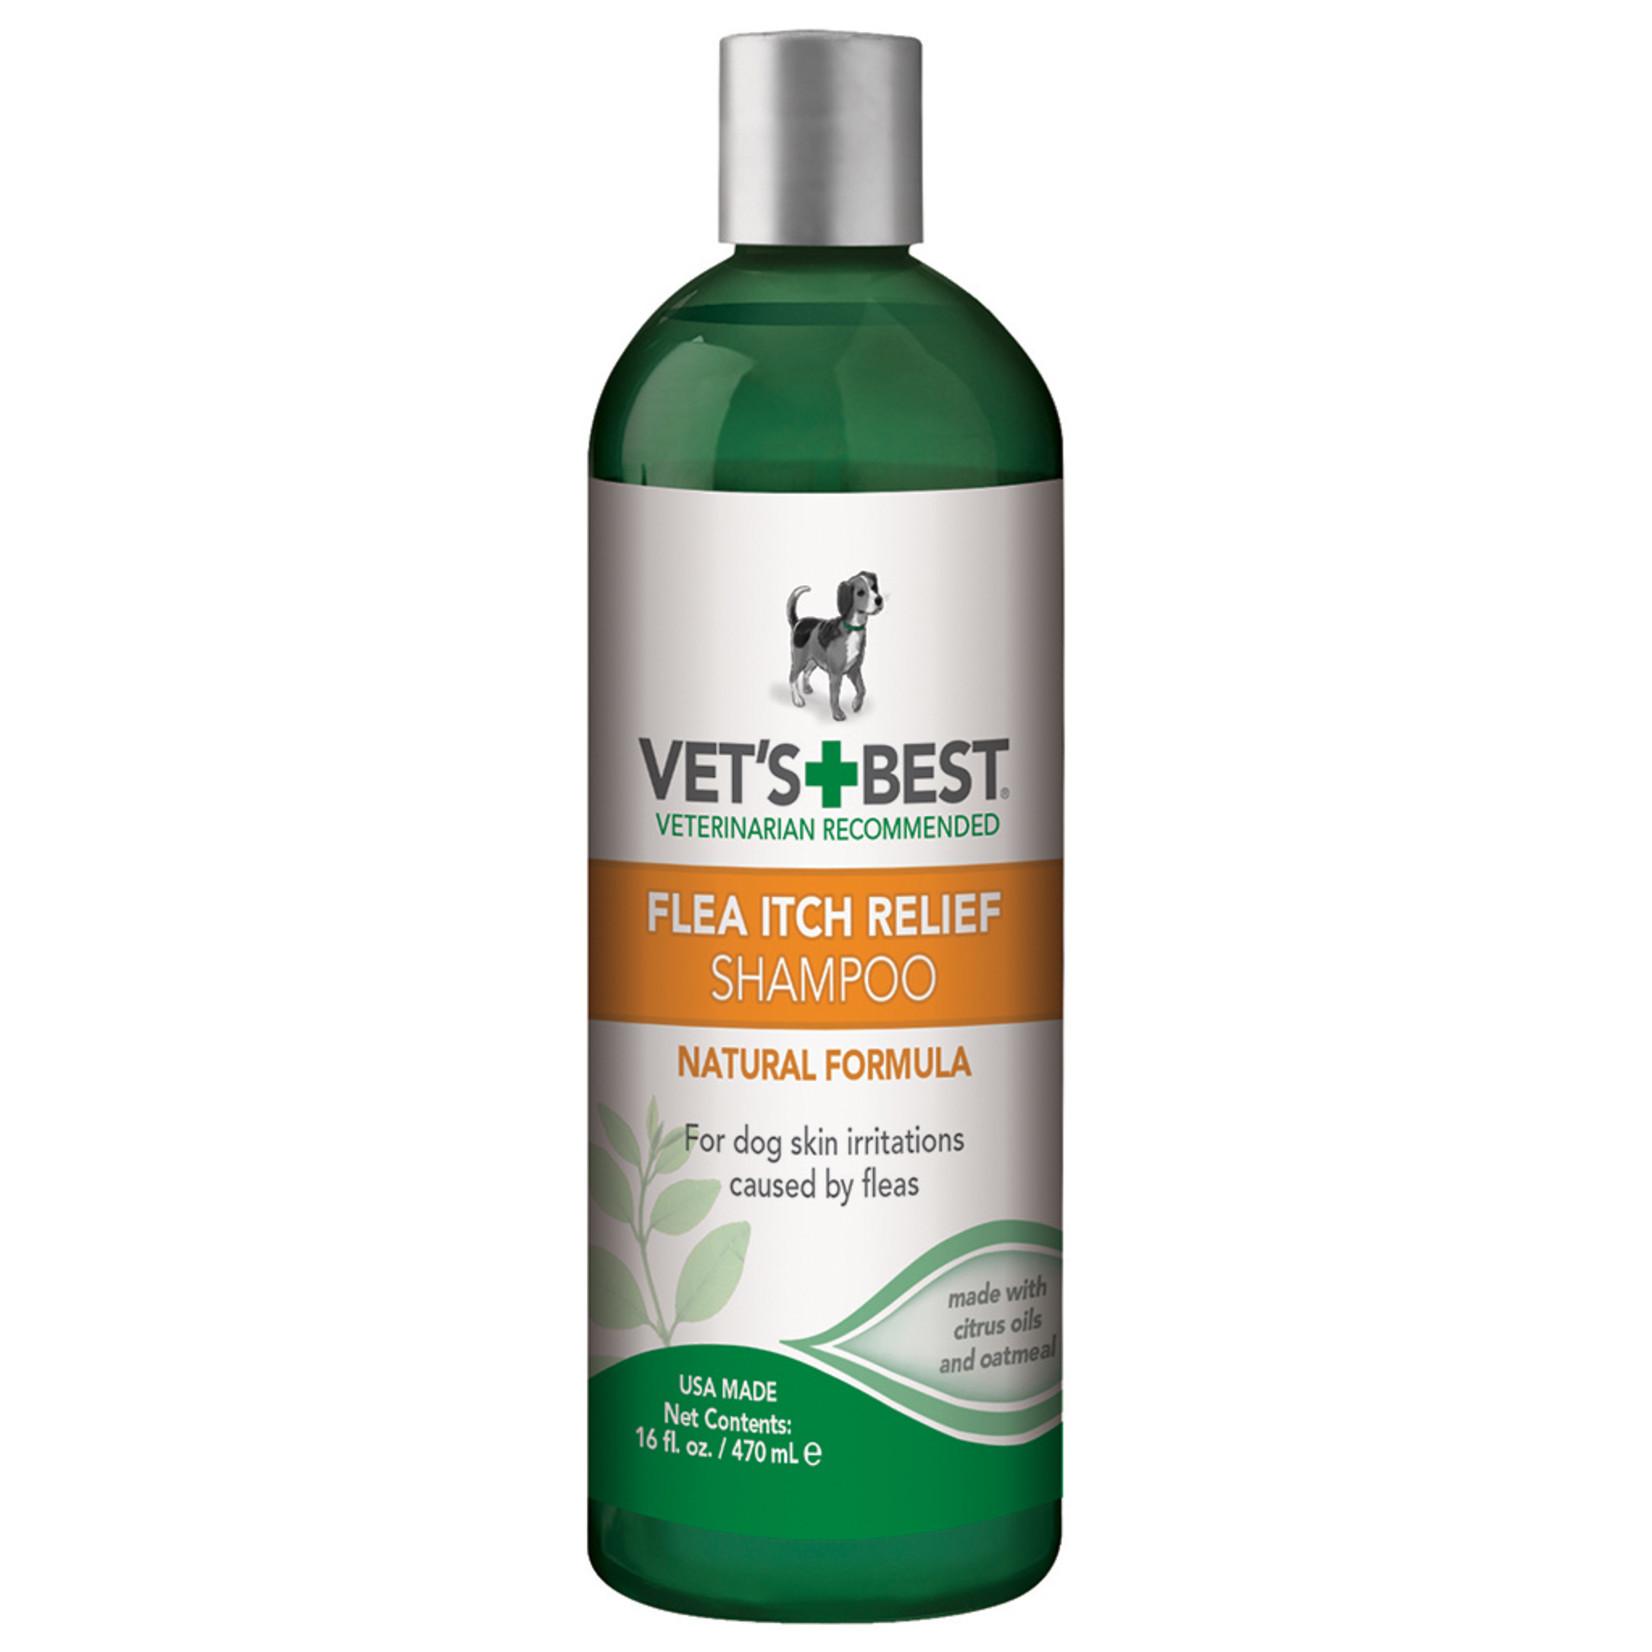 Flea Itch Relief Shampoo 16oz